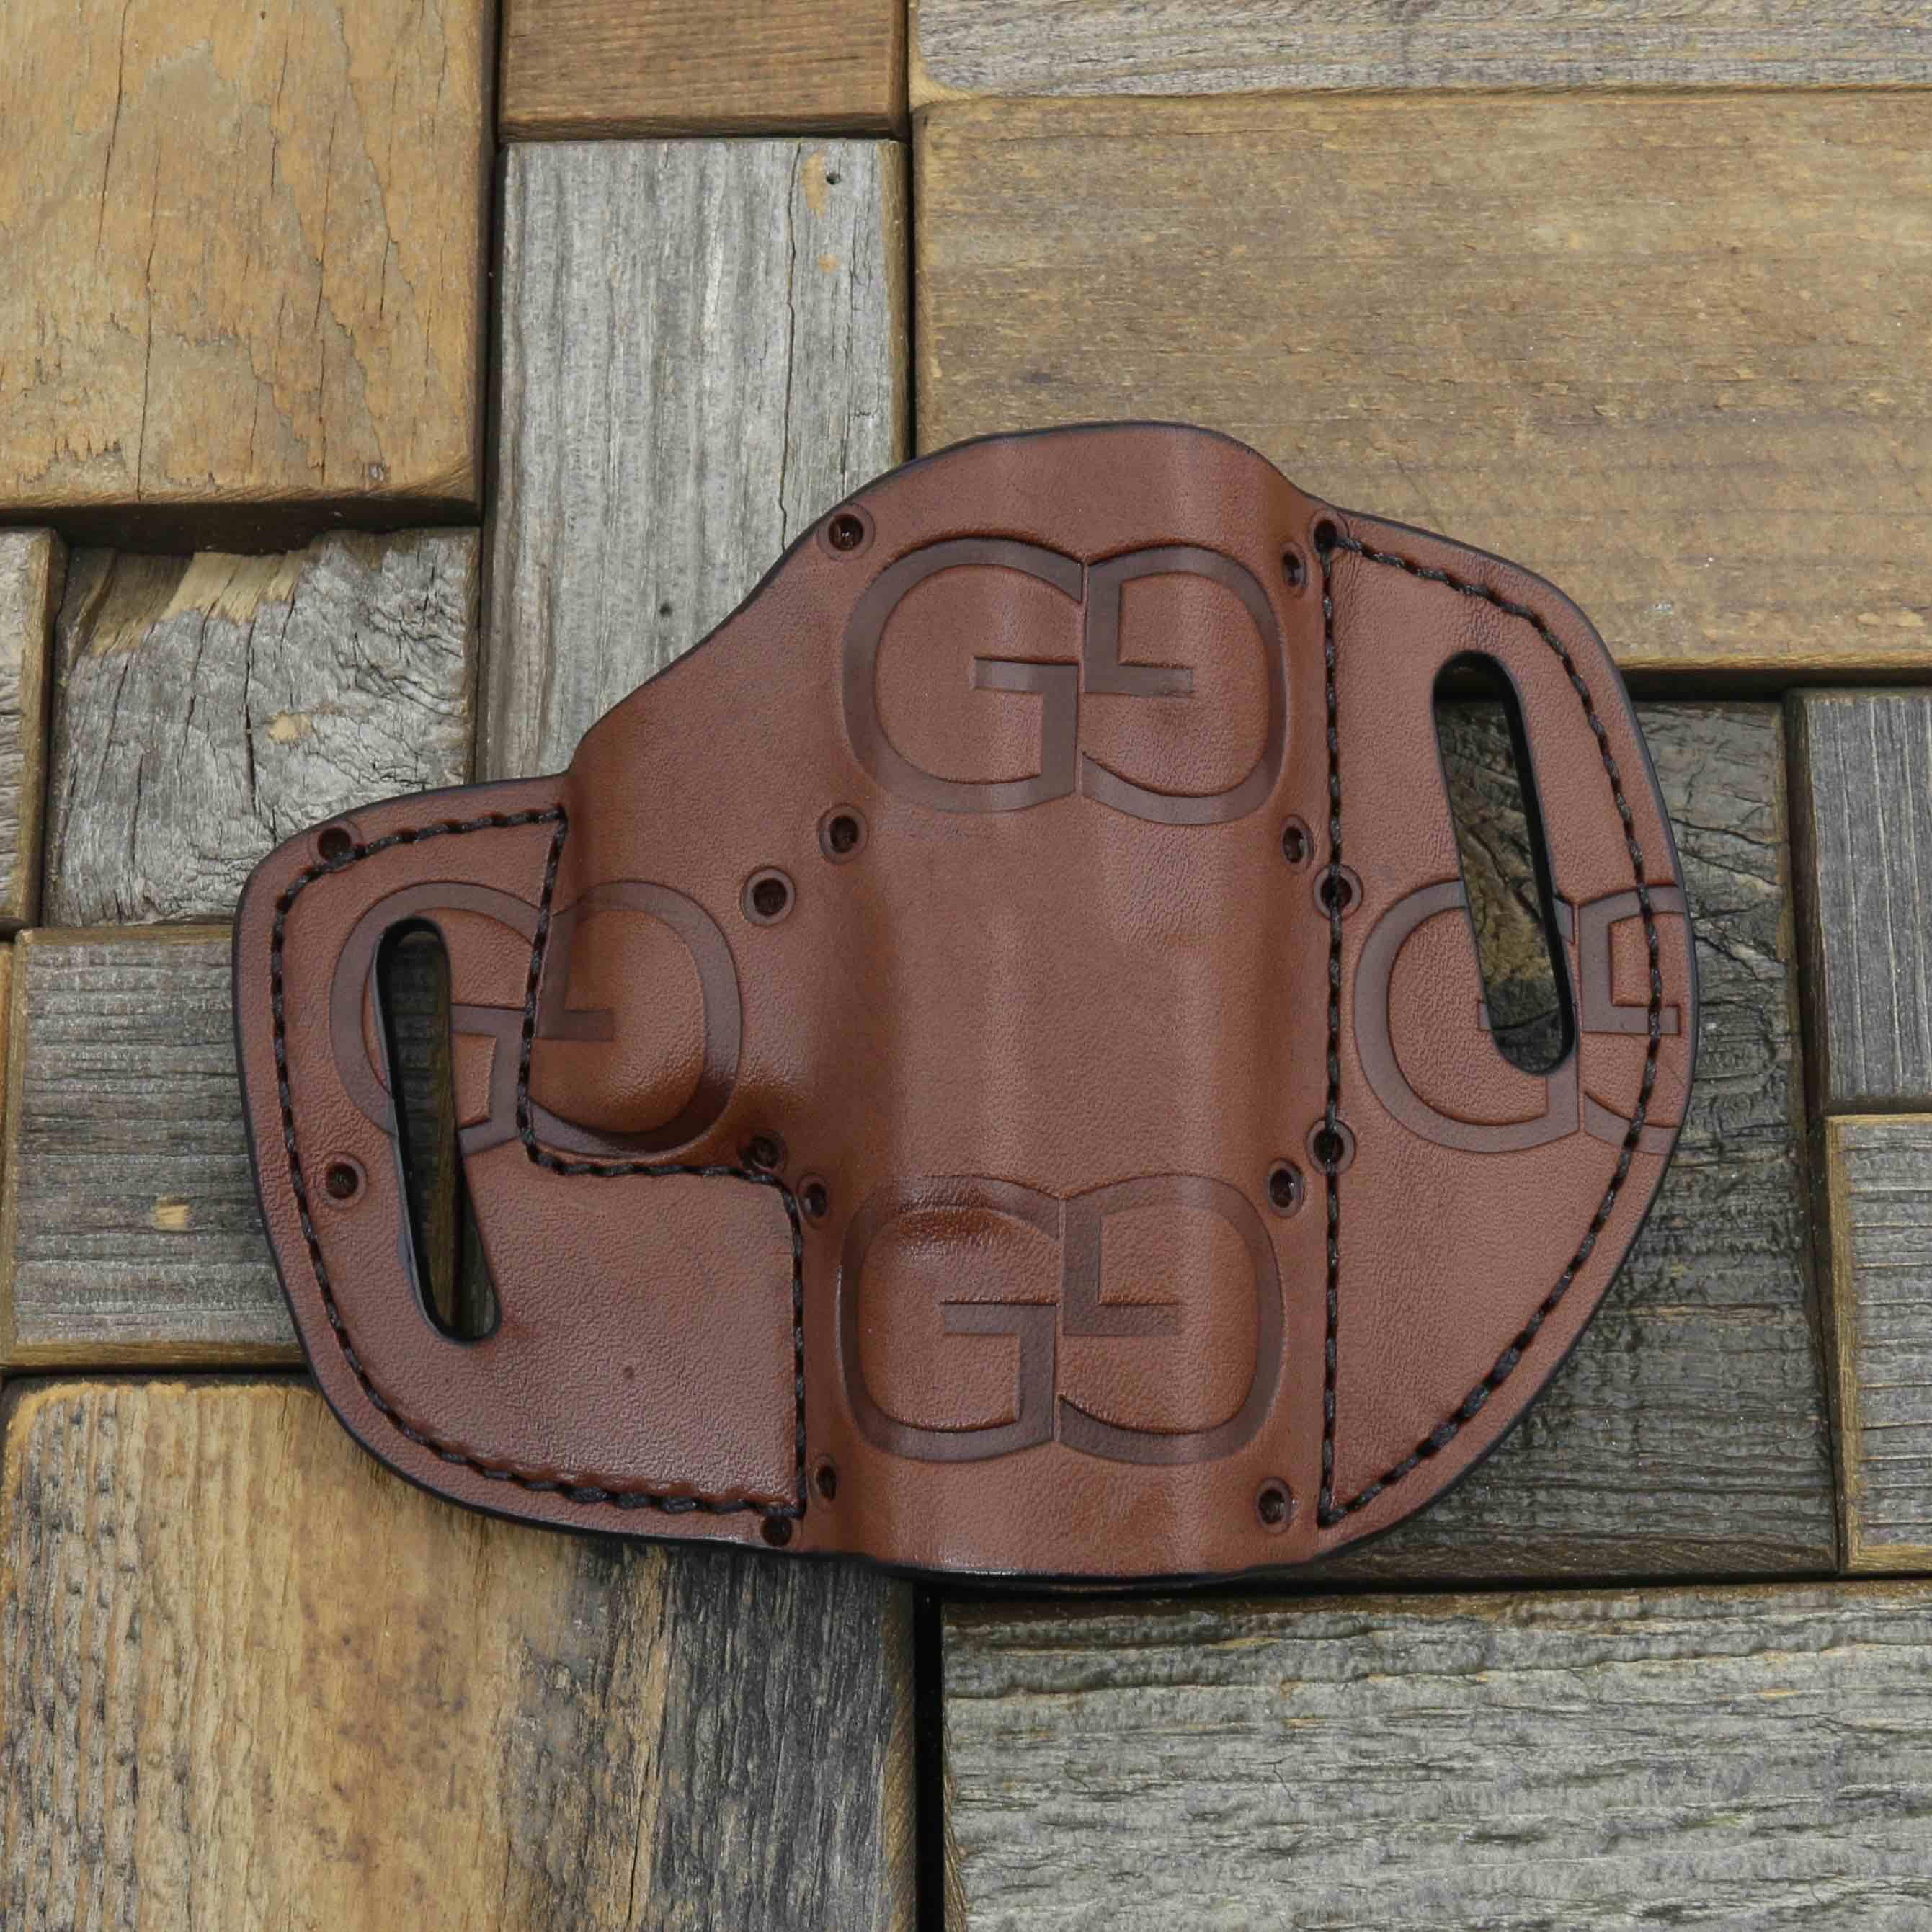 Custom gucci holster